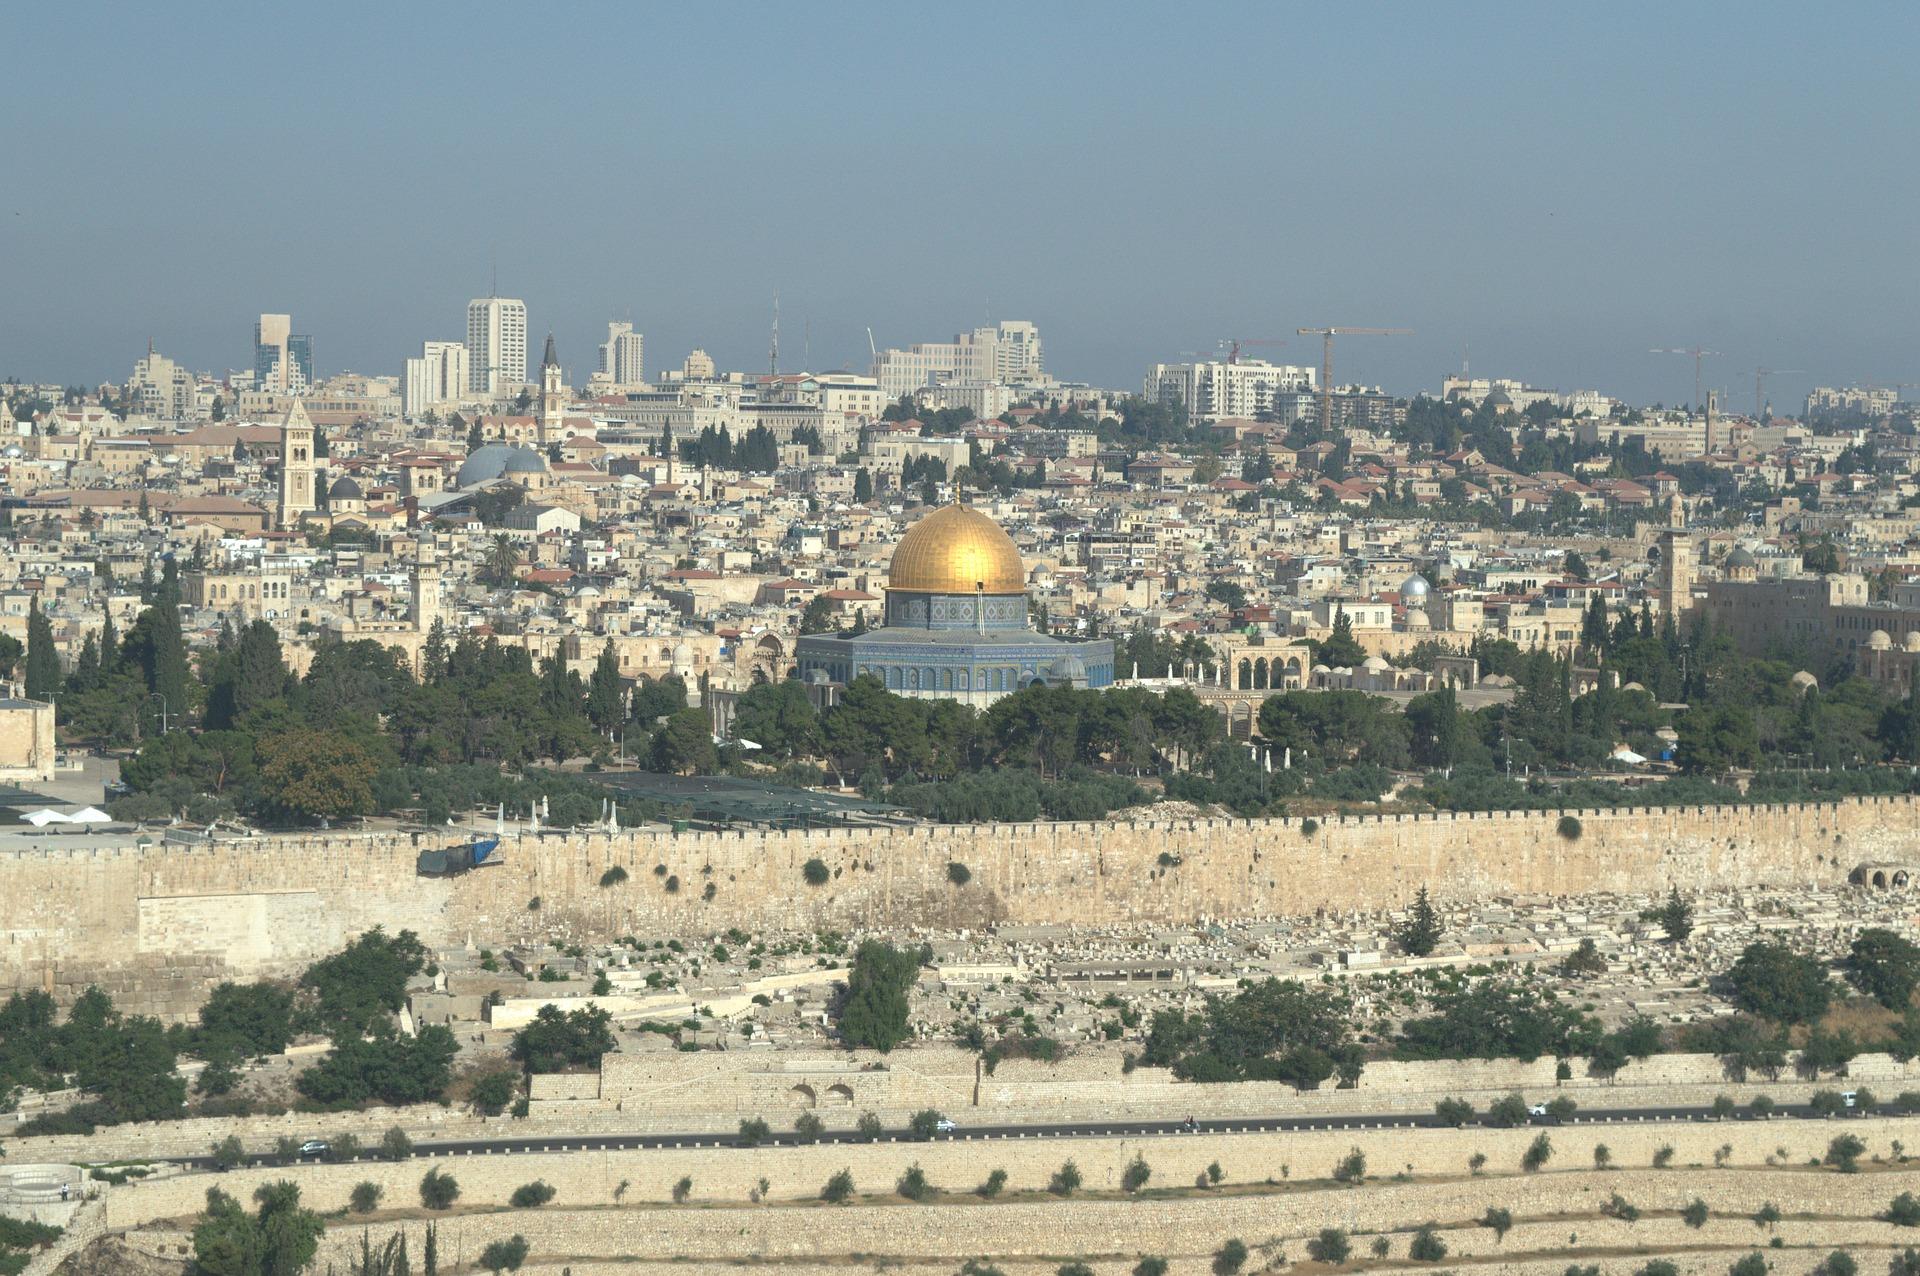 jerusalem-953226_1920.jpg